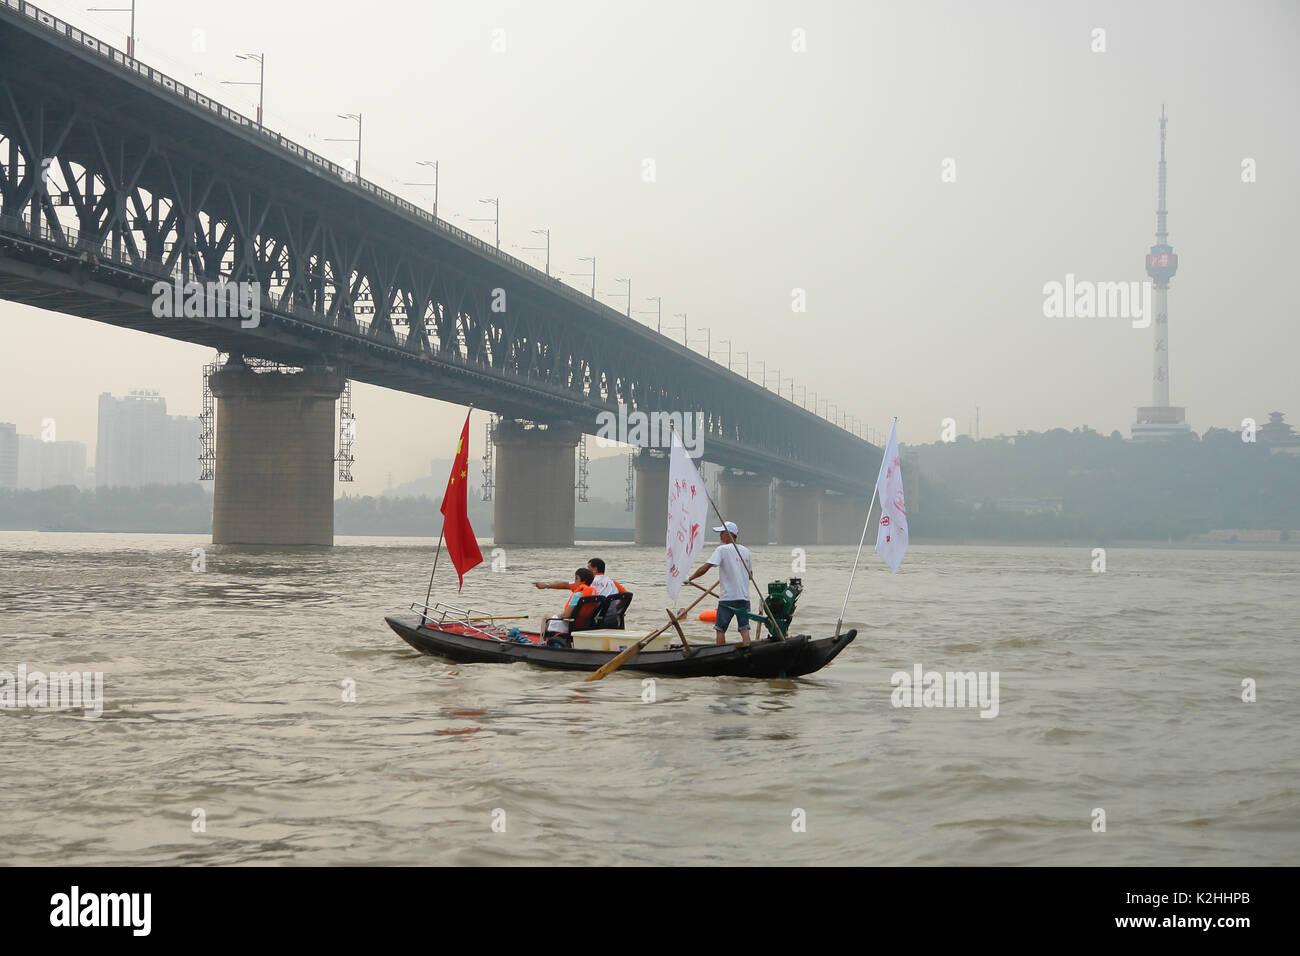 yangtse river swiming club - Stock Image